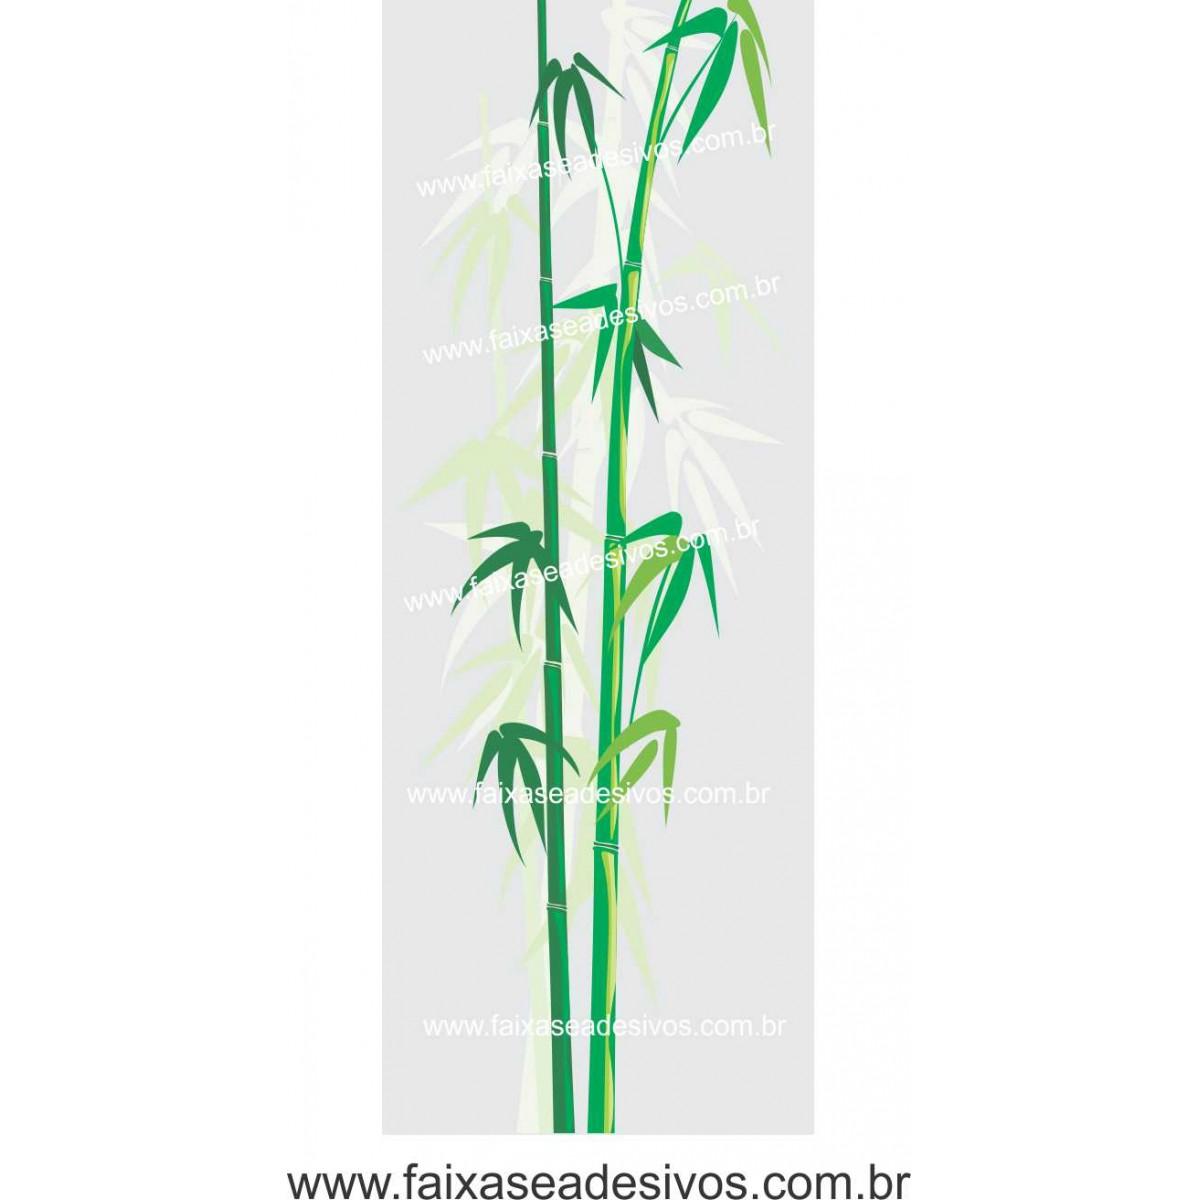 096 - Adesivo Jateado para vidro Bamboo 220x70cm  - FAC Signs Impressão Digital